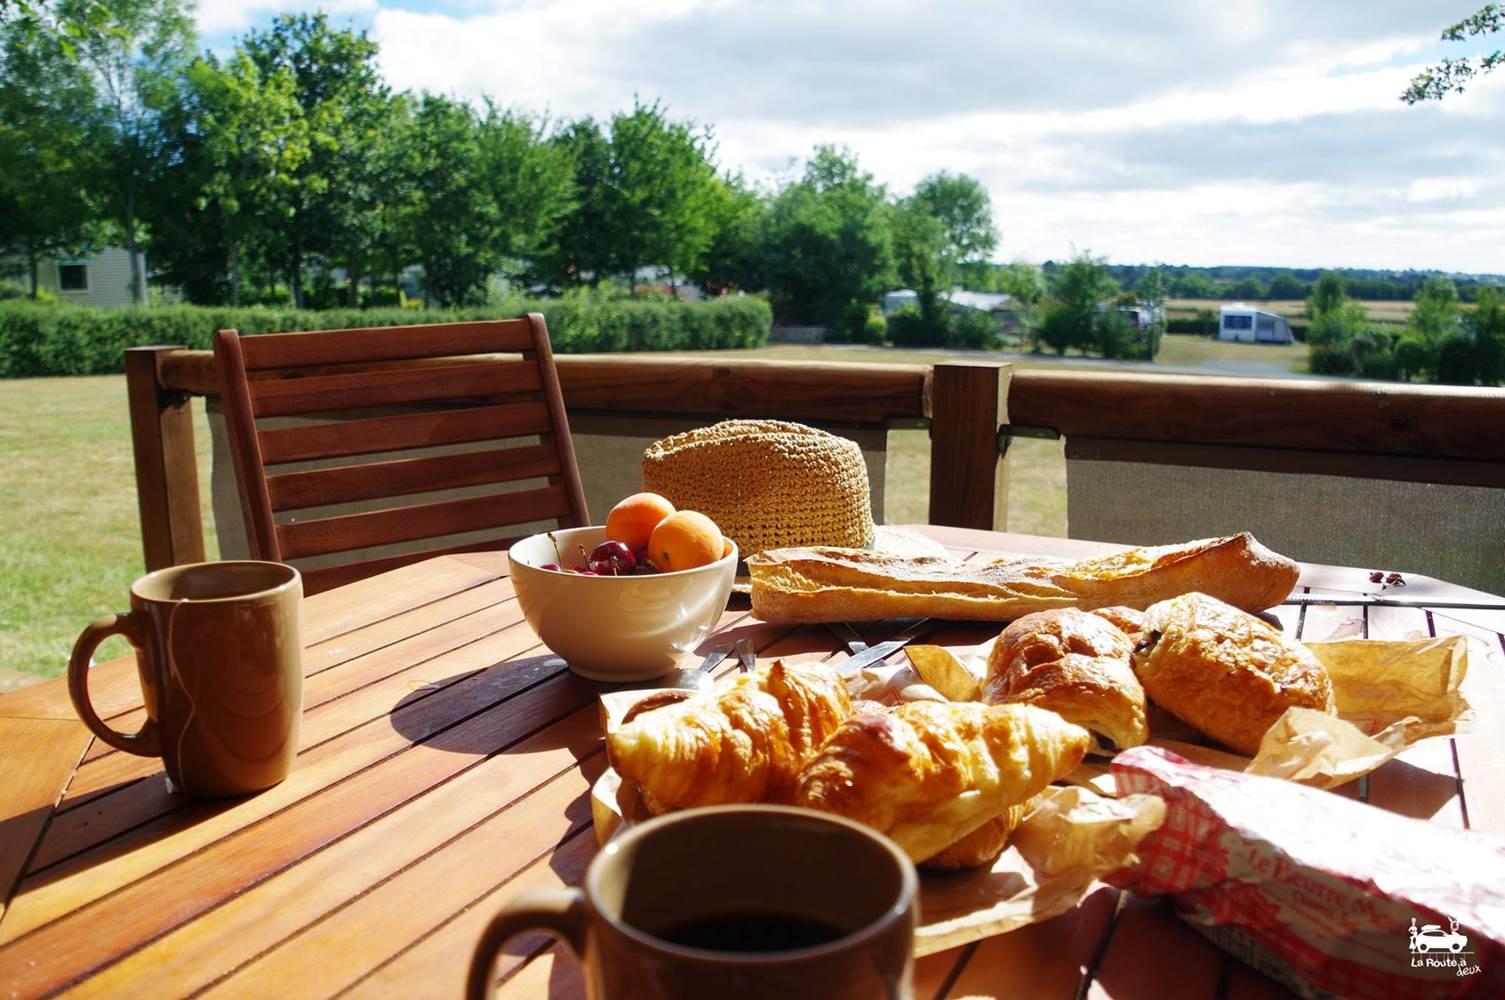 Petit déjeuner en Tente Lodge ©